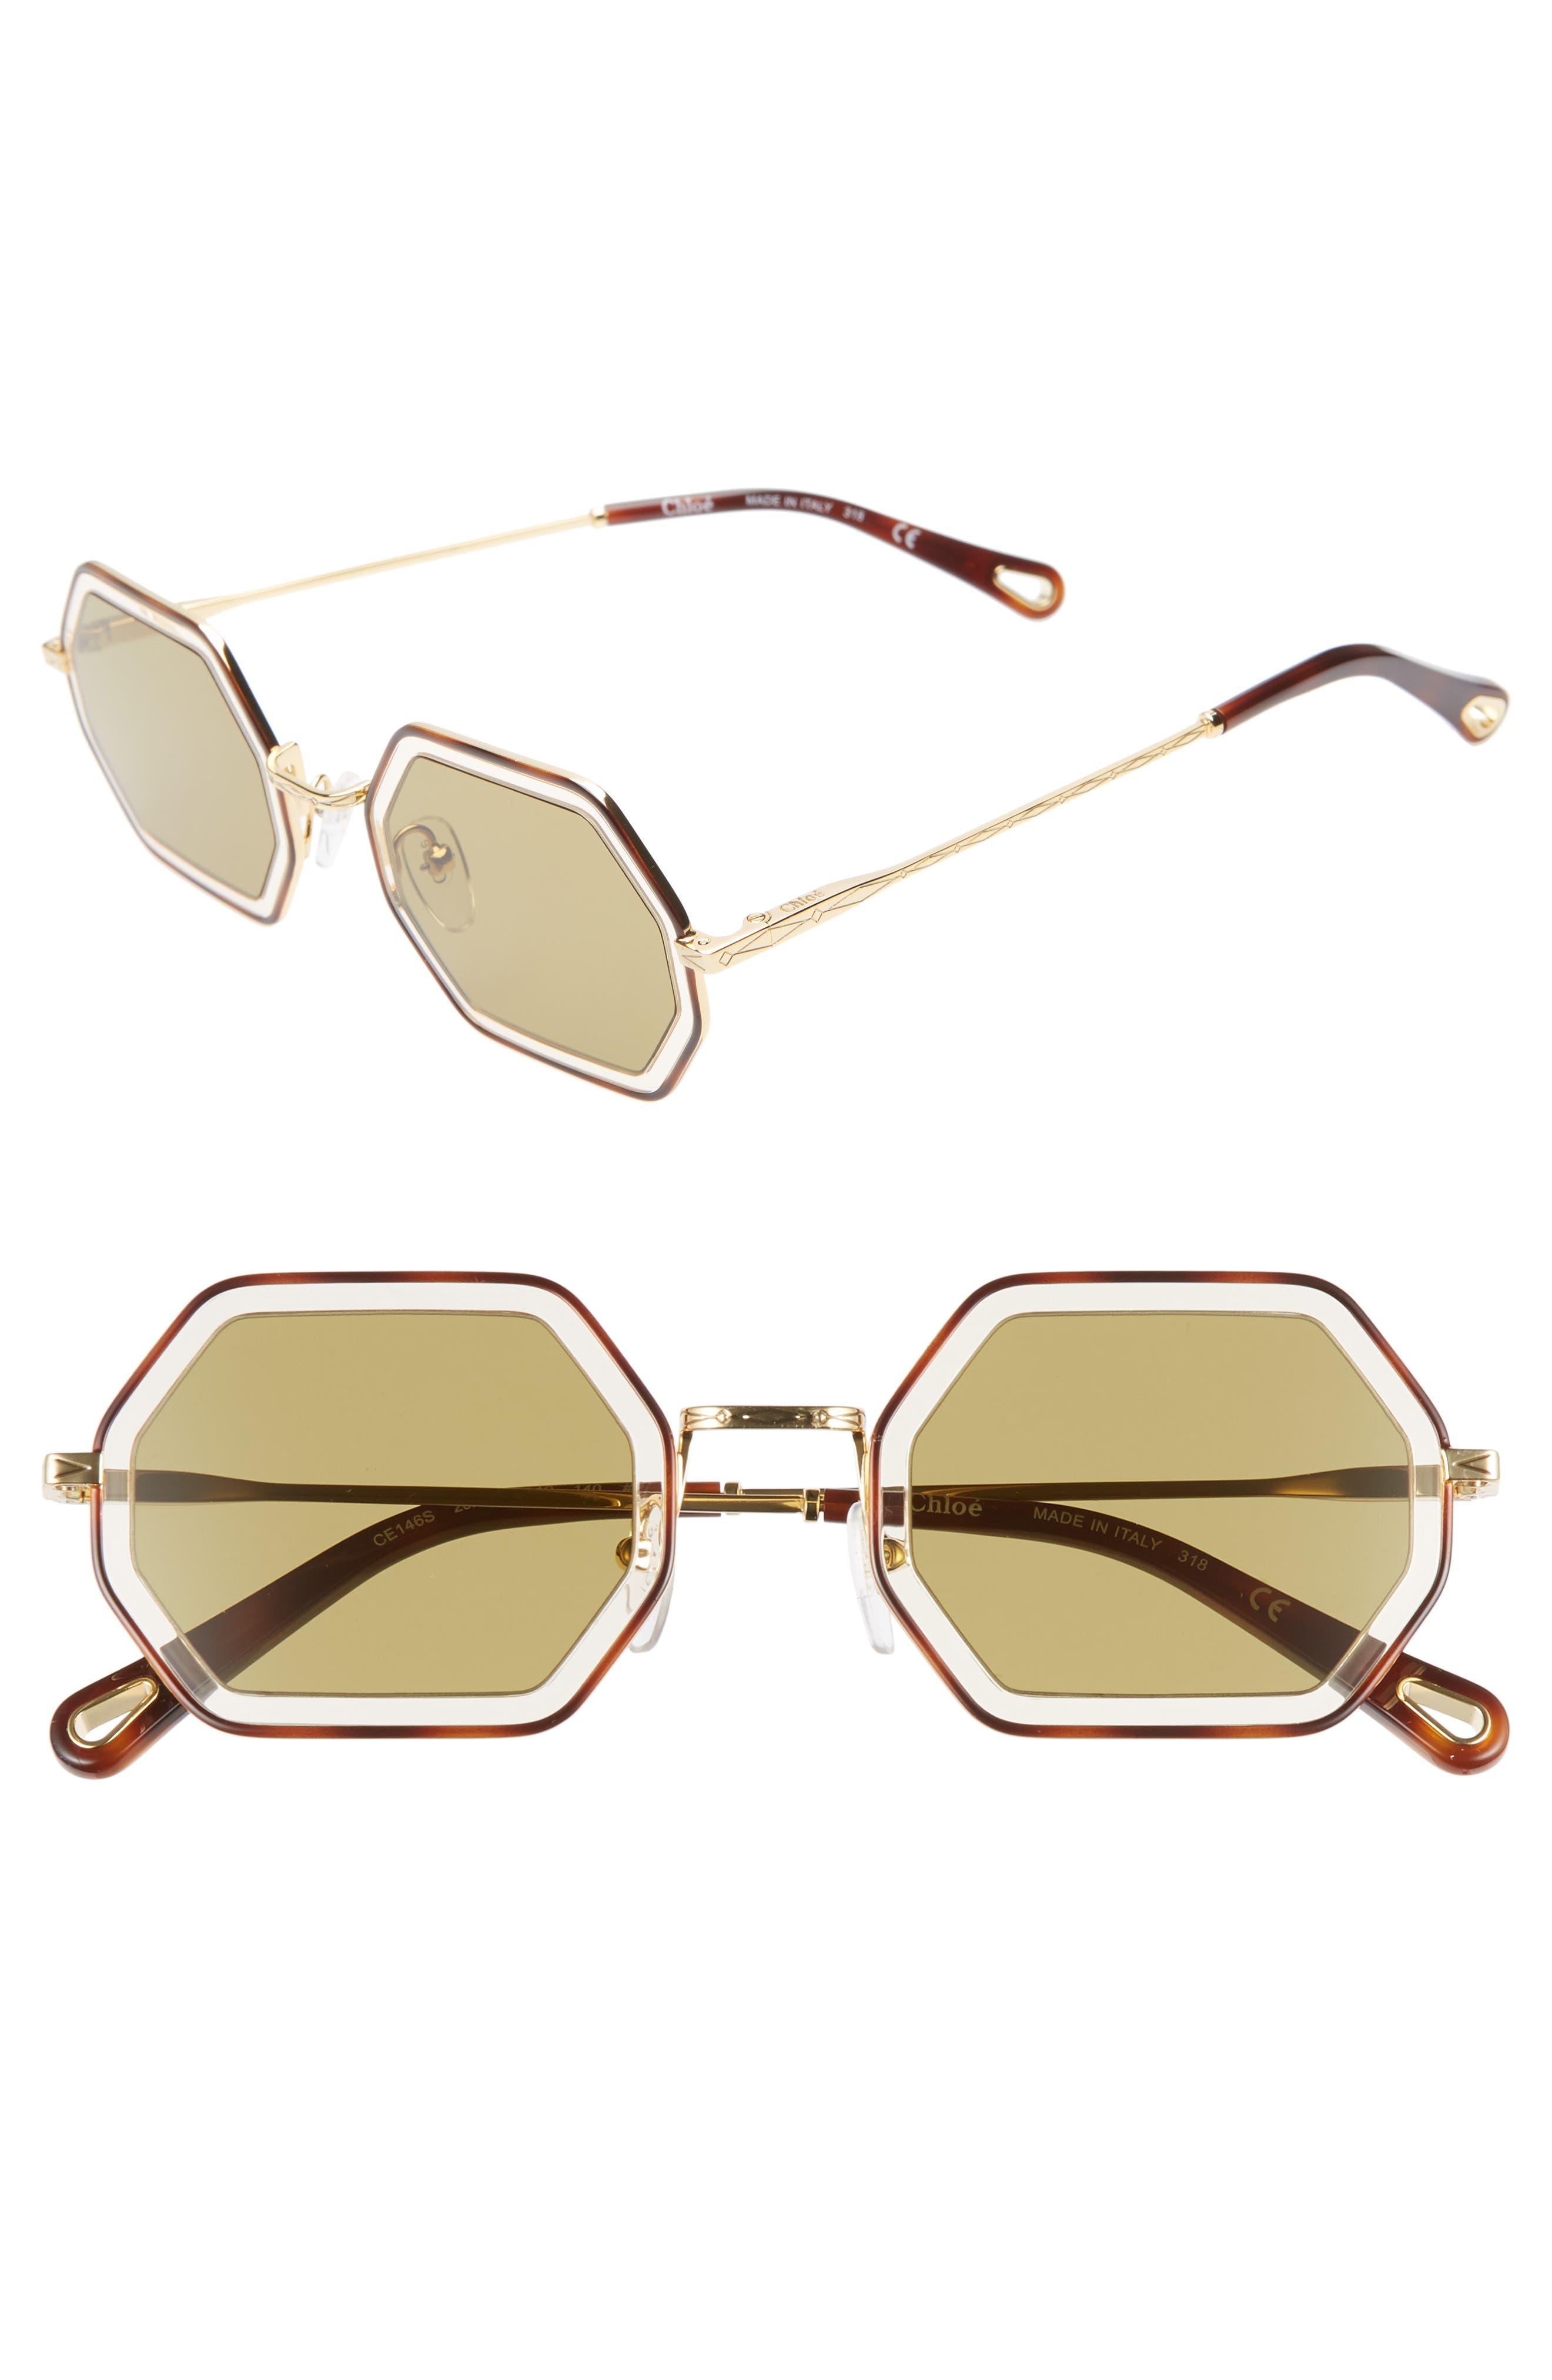 6807883075f Chloé Sunglasses for Women